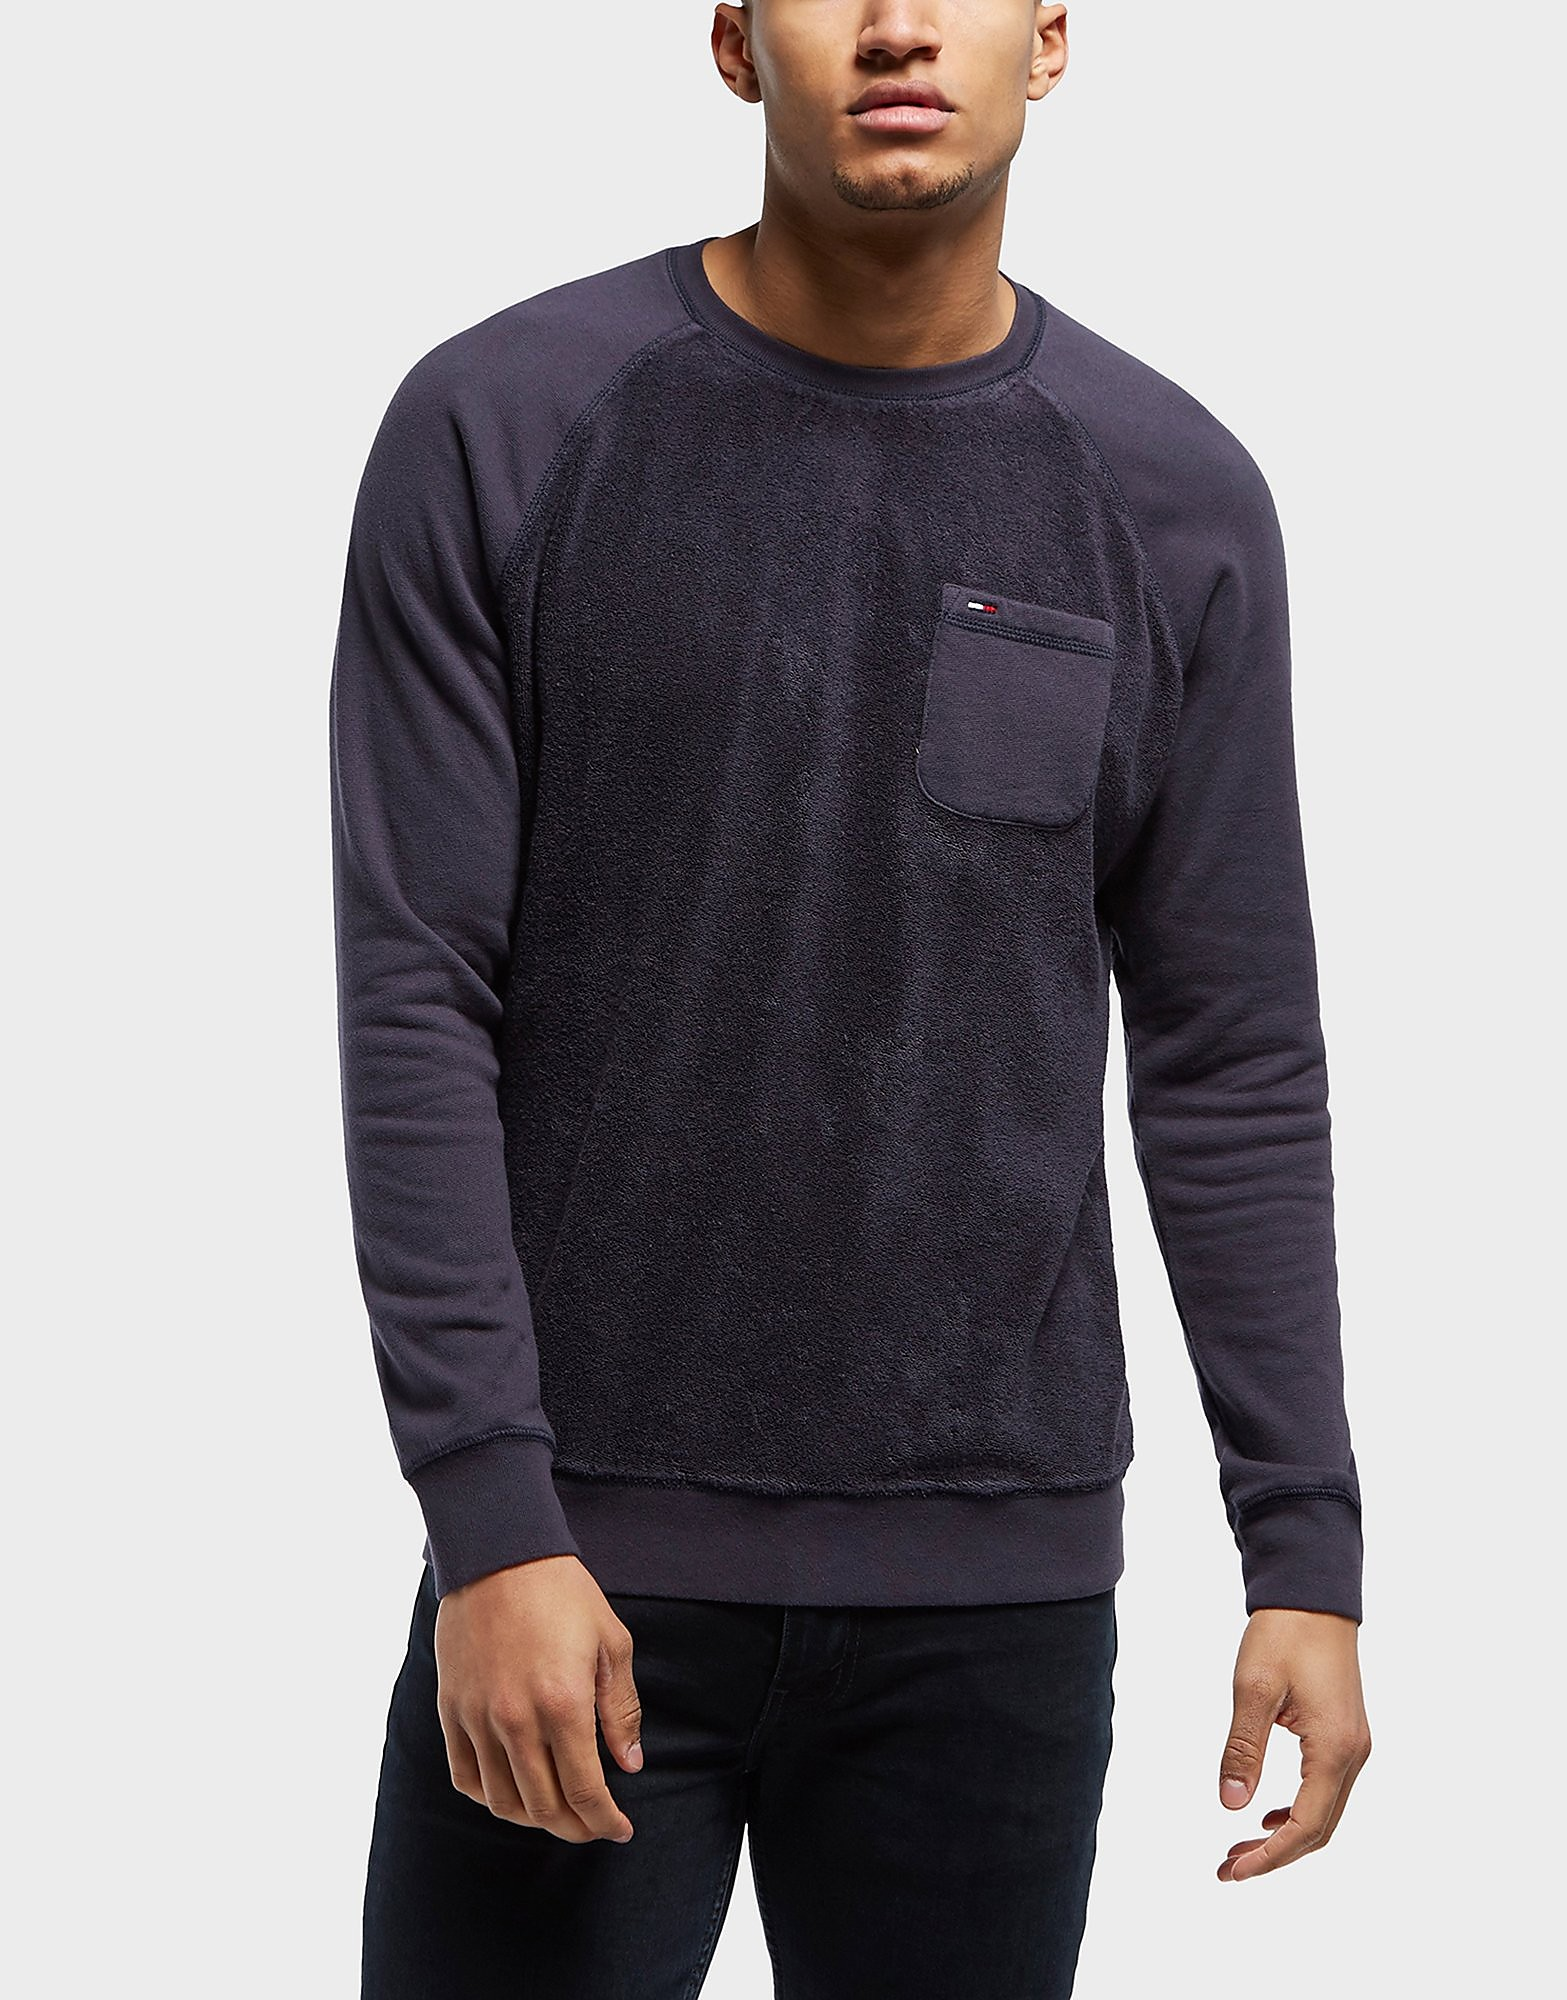 Tommy Hilfiger Towelling Pocket Crew Sweatshirt